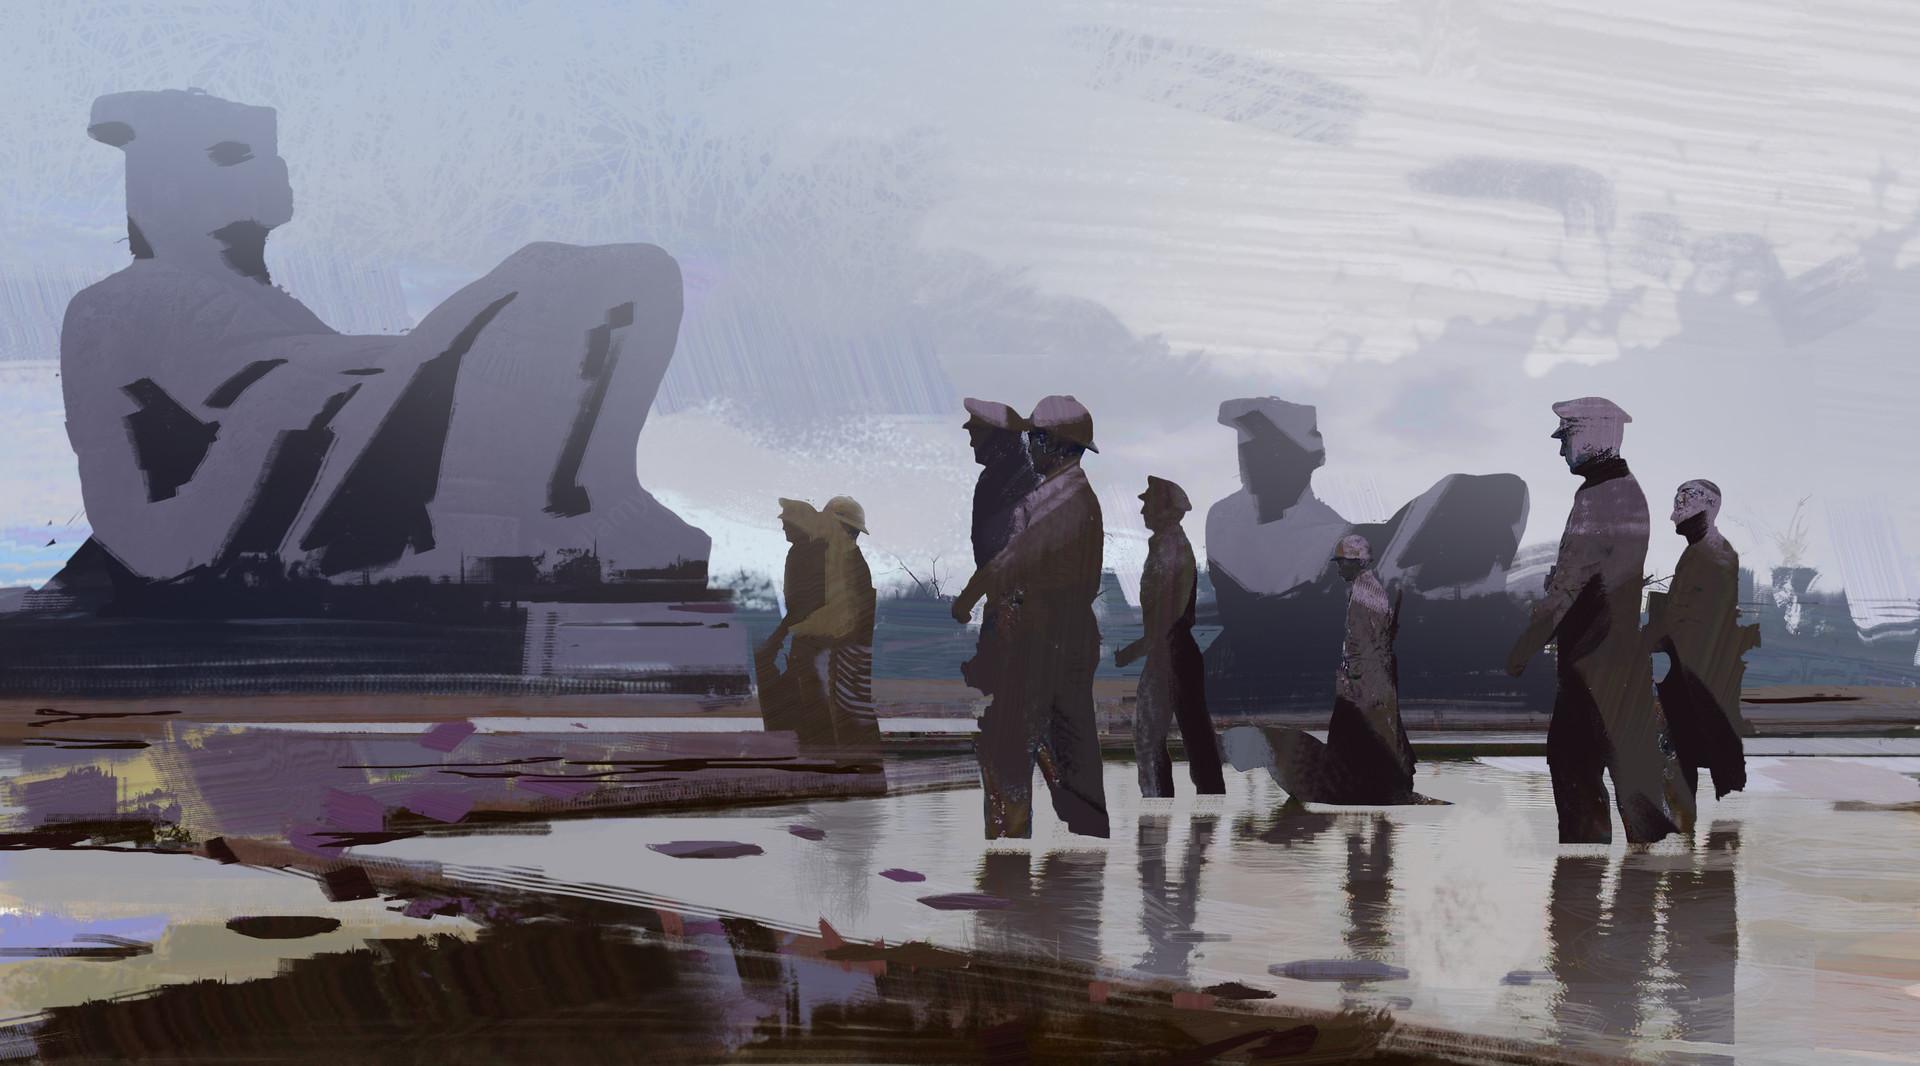 Yujin choo revolutionary totem 01 sketch